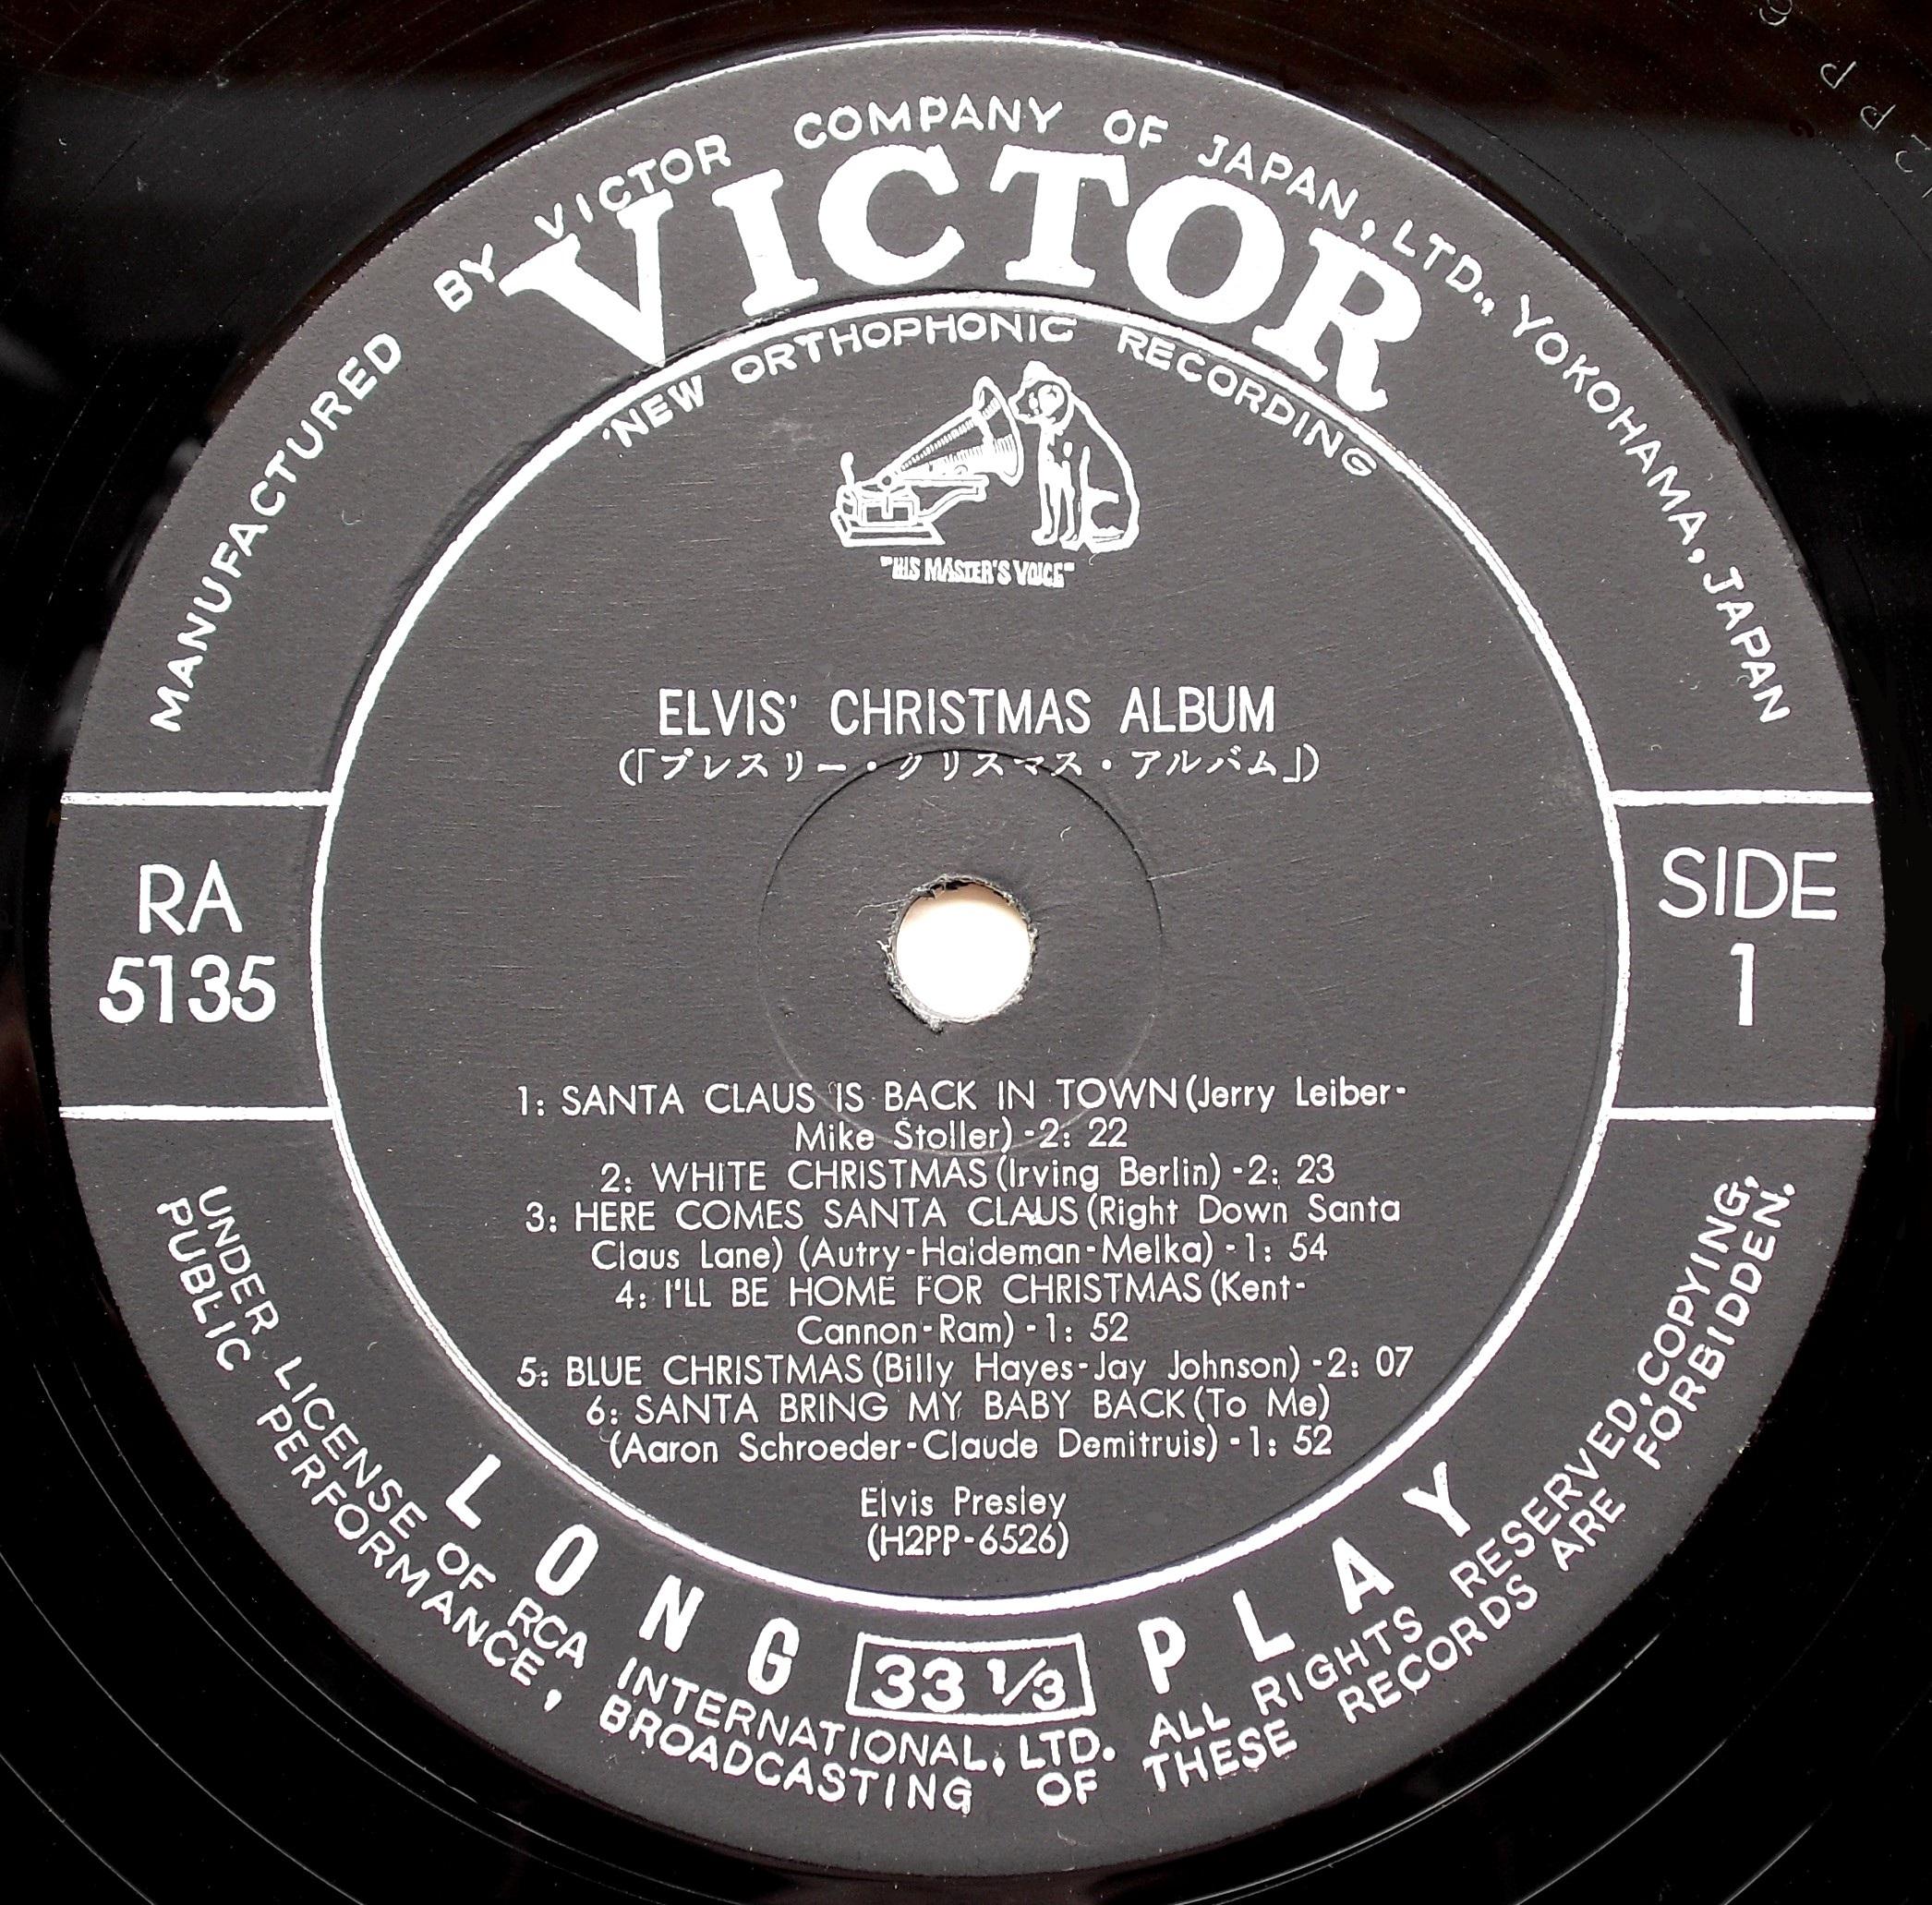 ELVIS' CHRISTMAS ALBUM 04s1rgjf8